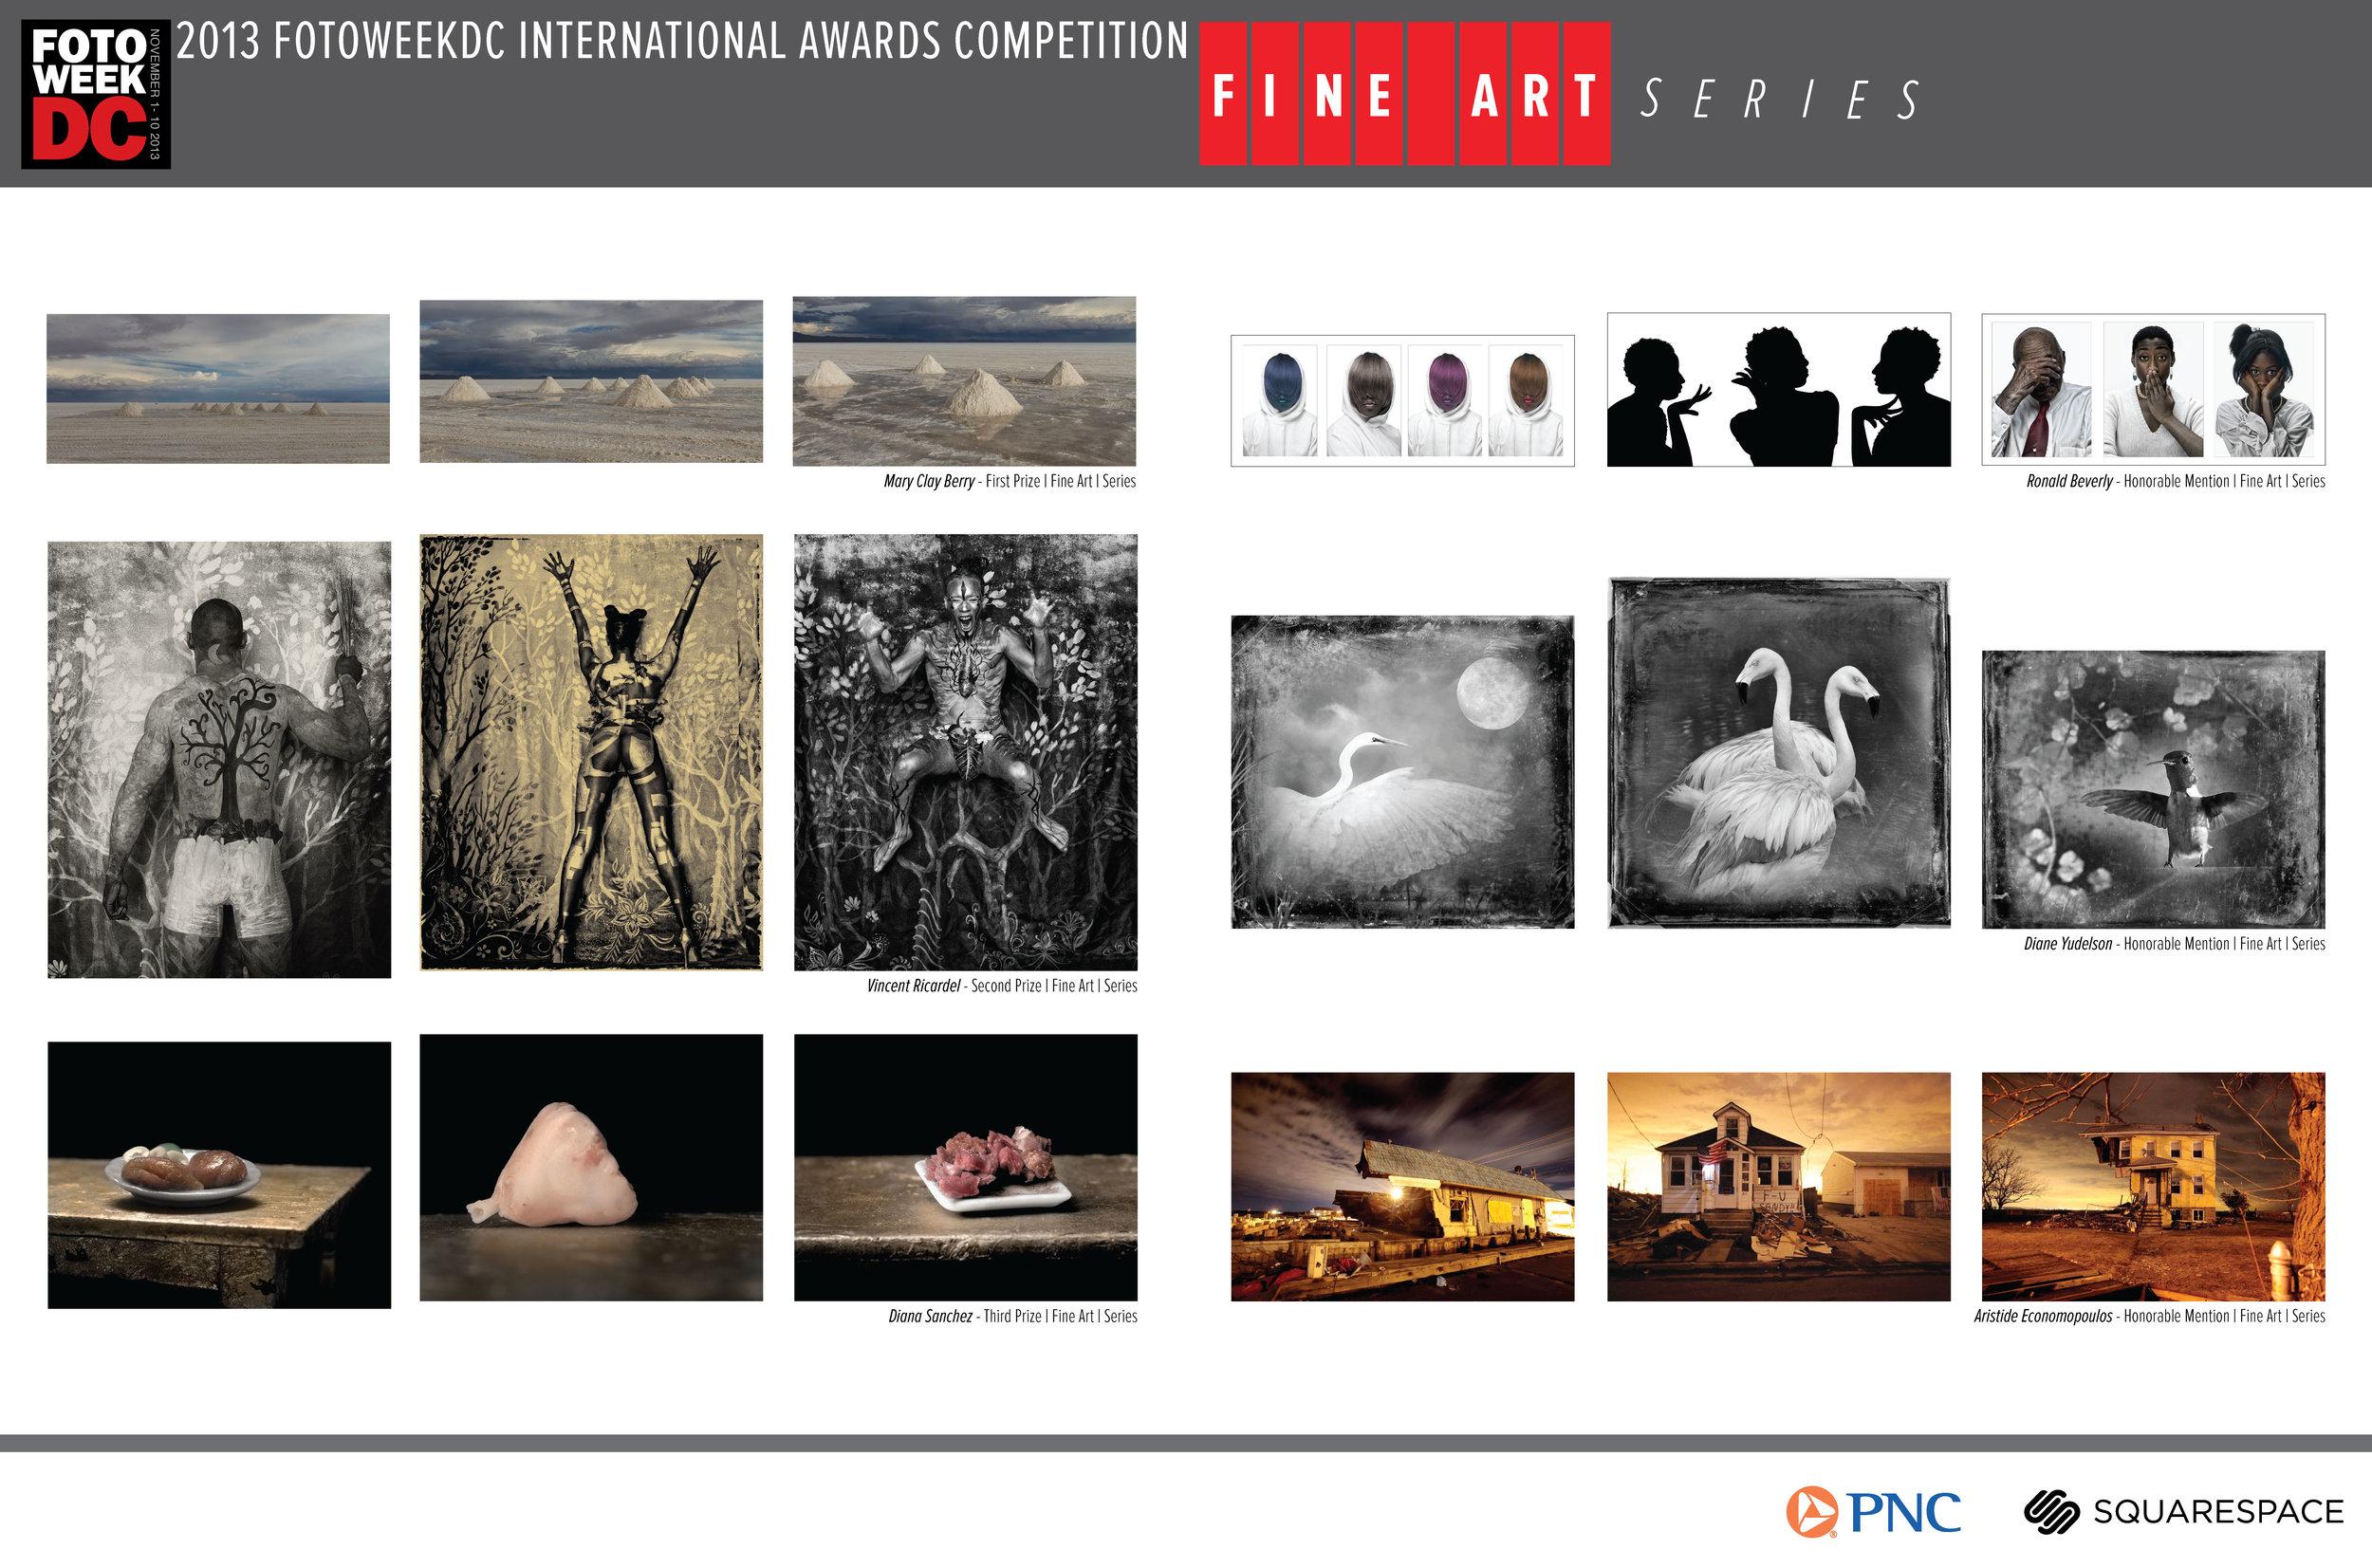 Fine-Art_Series.jpg